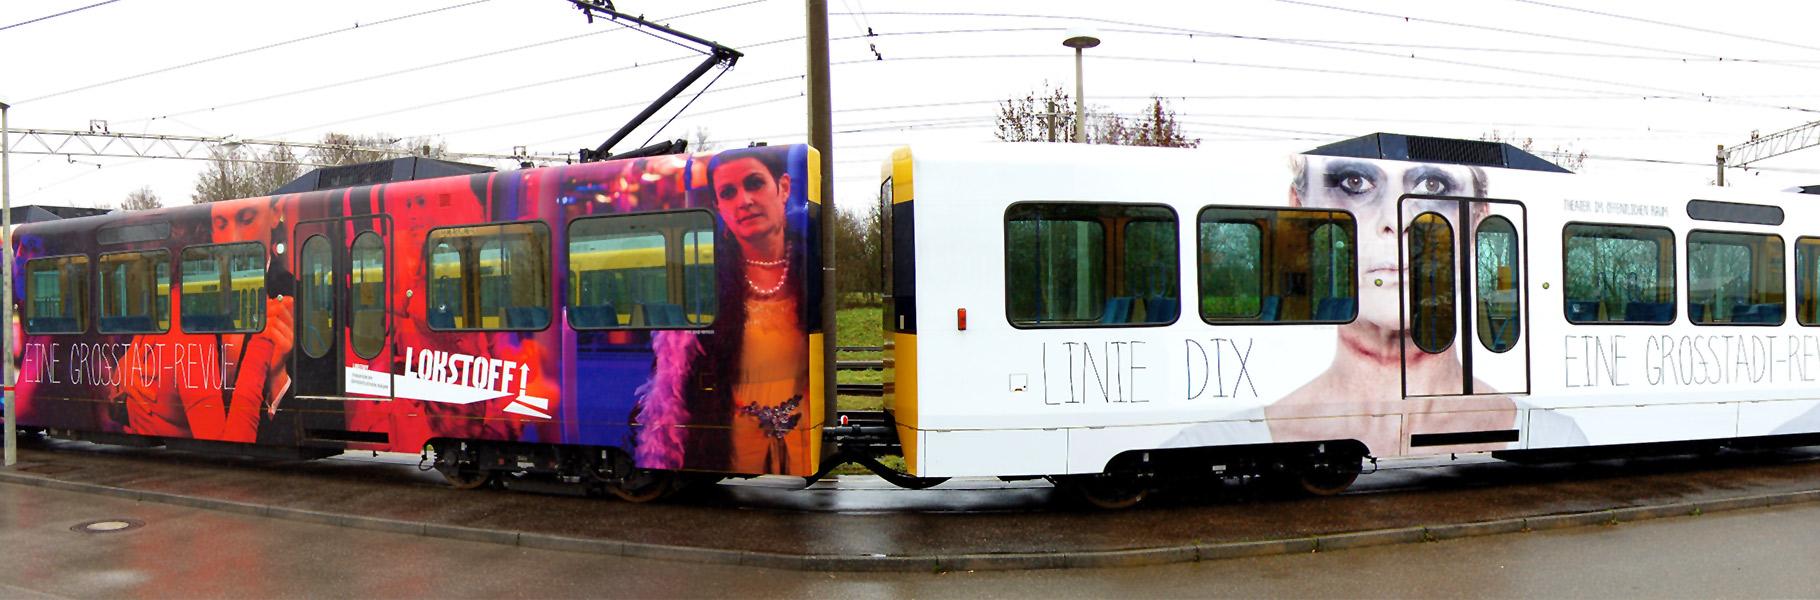 Motive zum Theaterstück als S-Bahn-Beklebung.